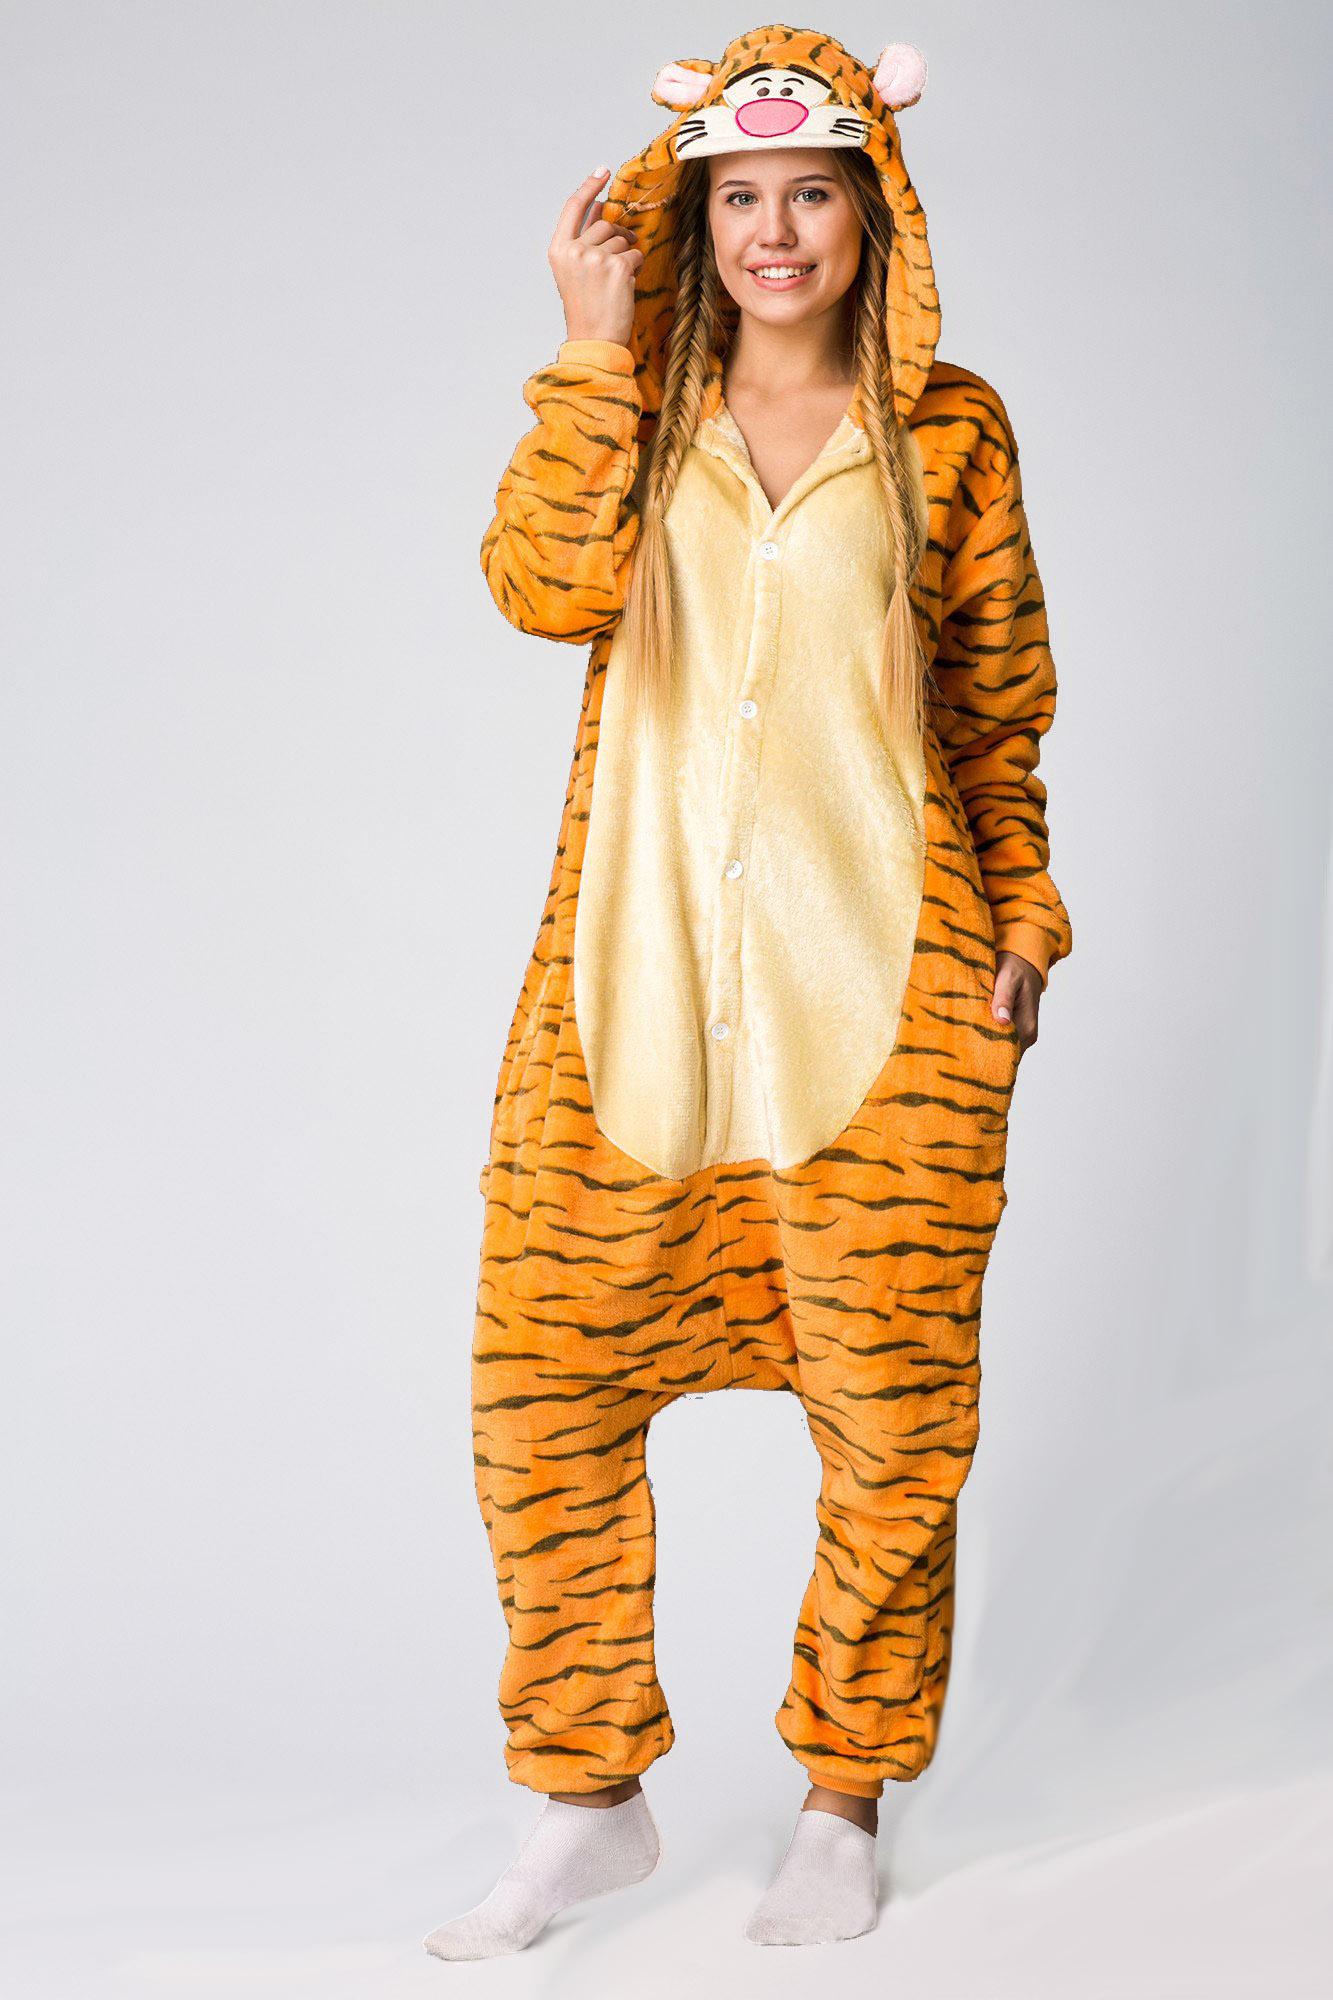 Тигр кигуруми пижама купить в СПБ 650a3c5e1be33